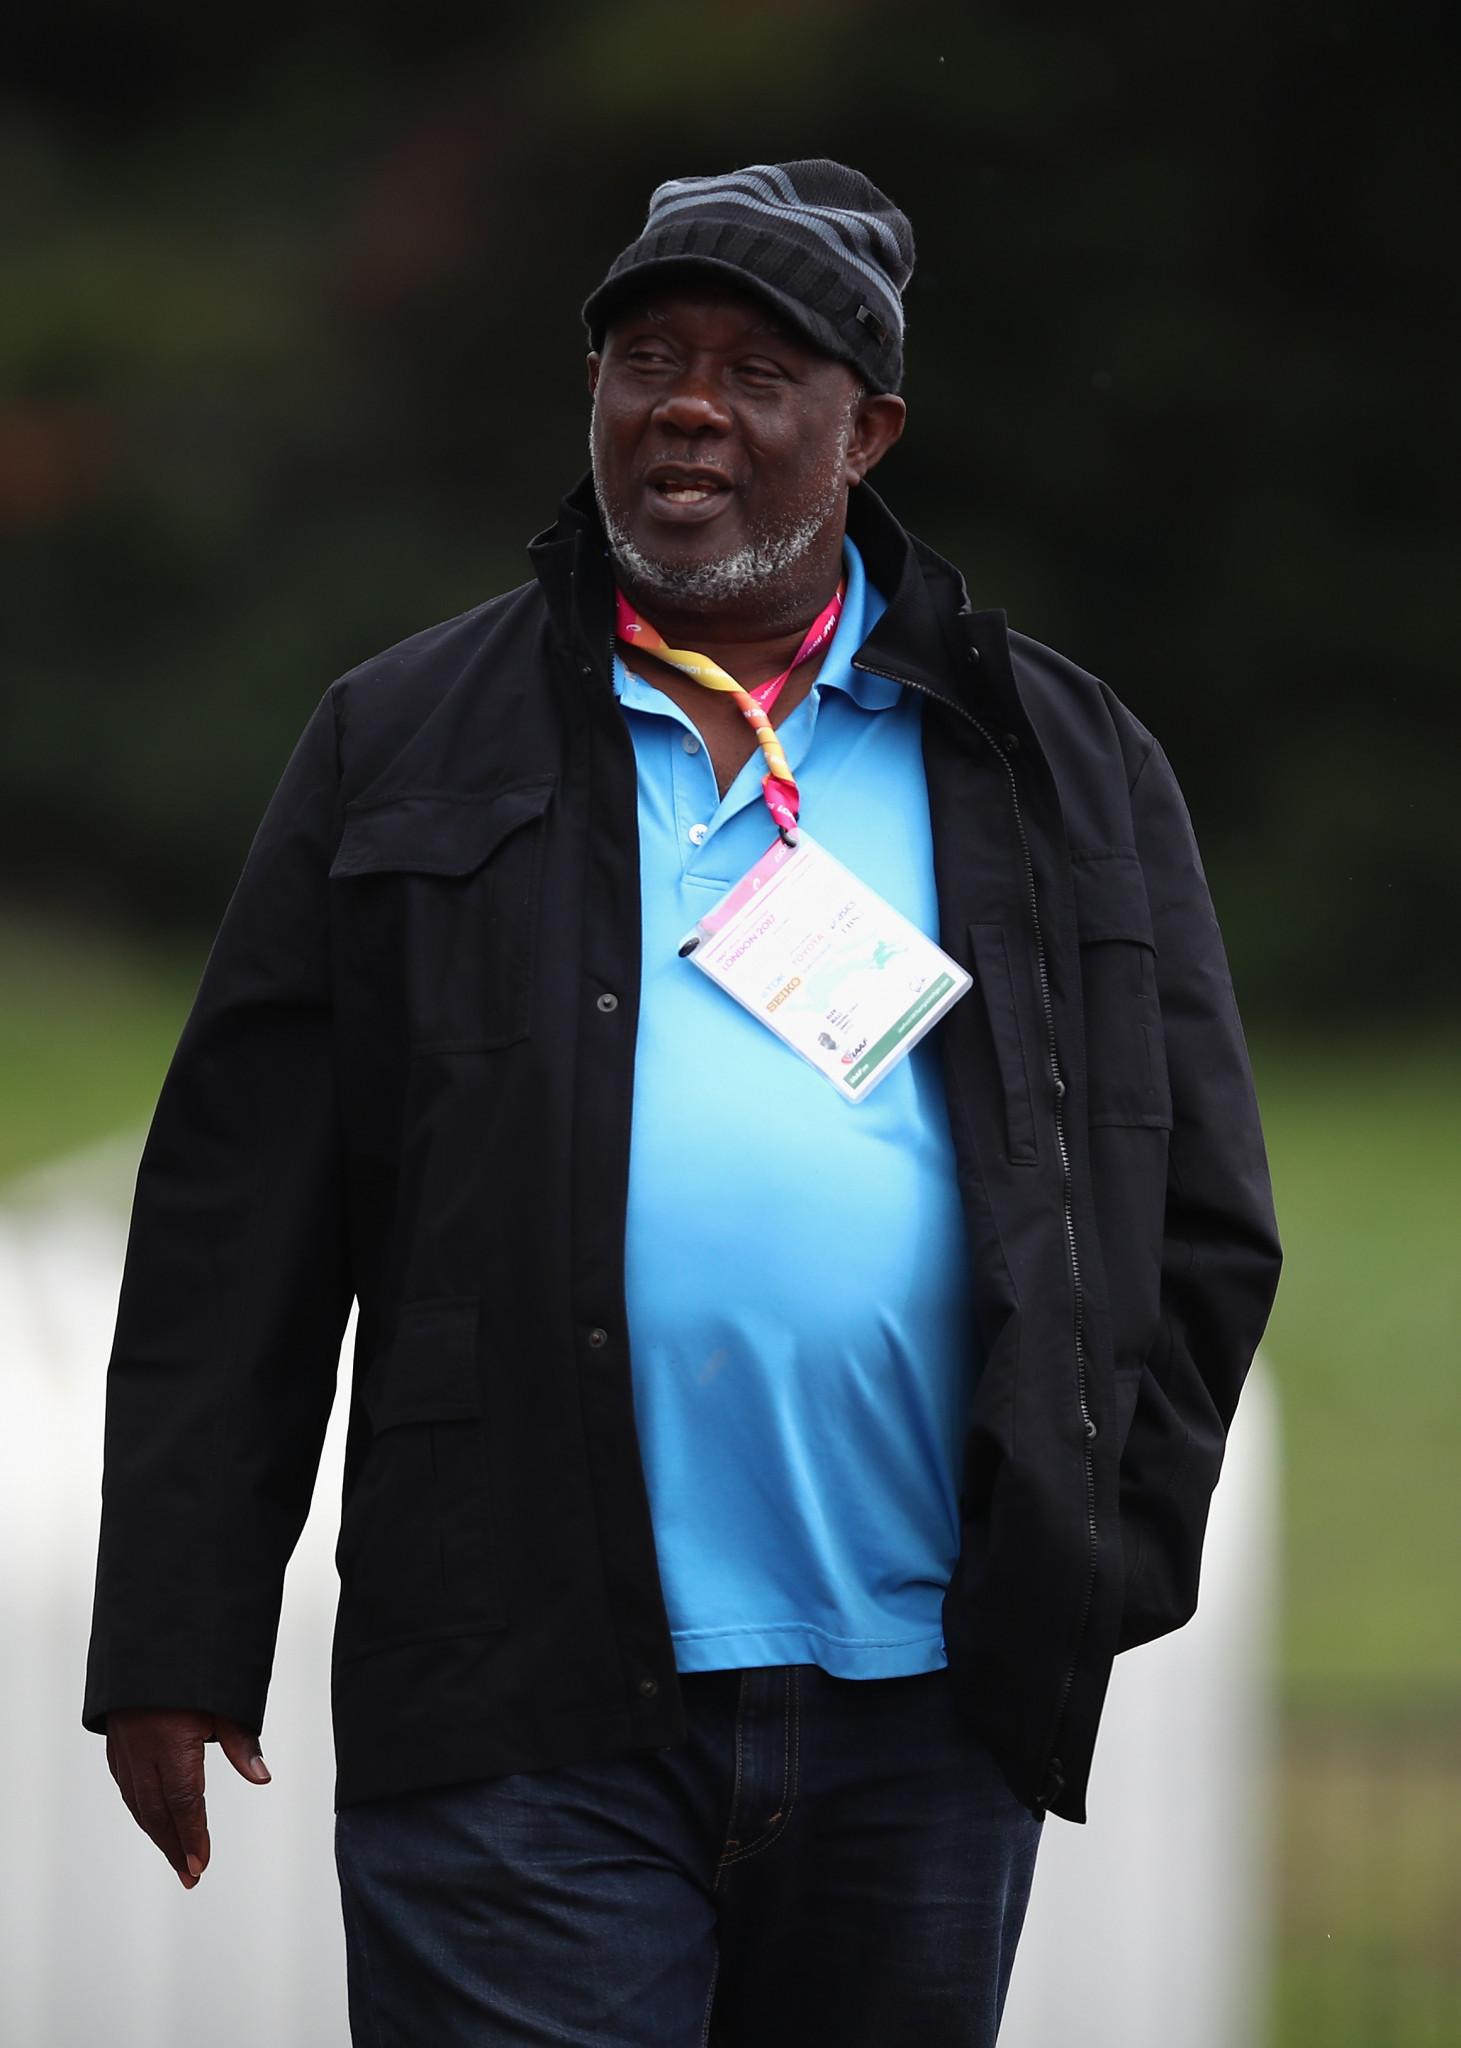 Usain Bolt's former coach calls for IOC to postpone Tokyo Olympics